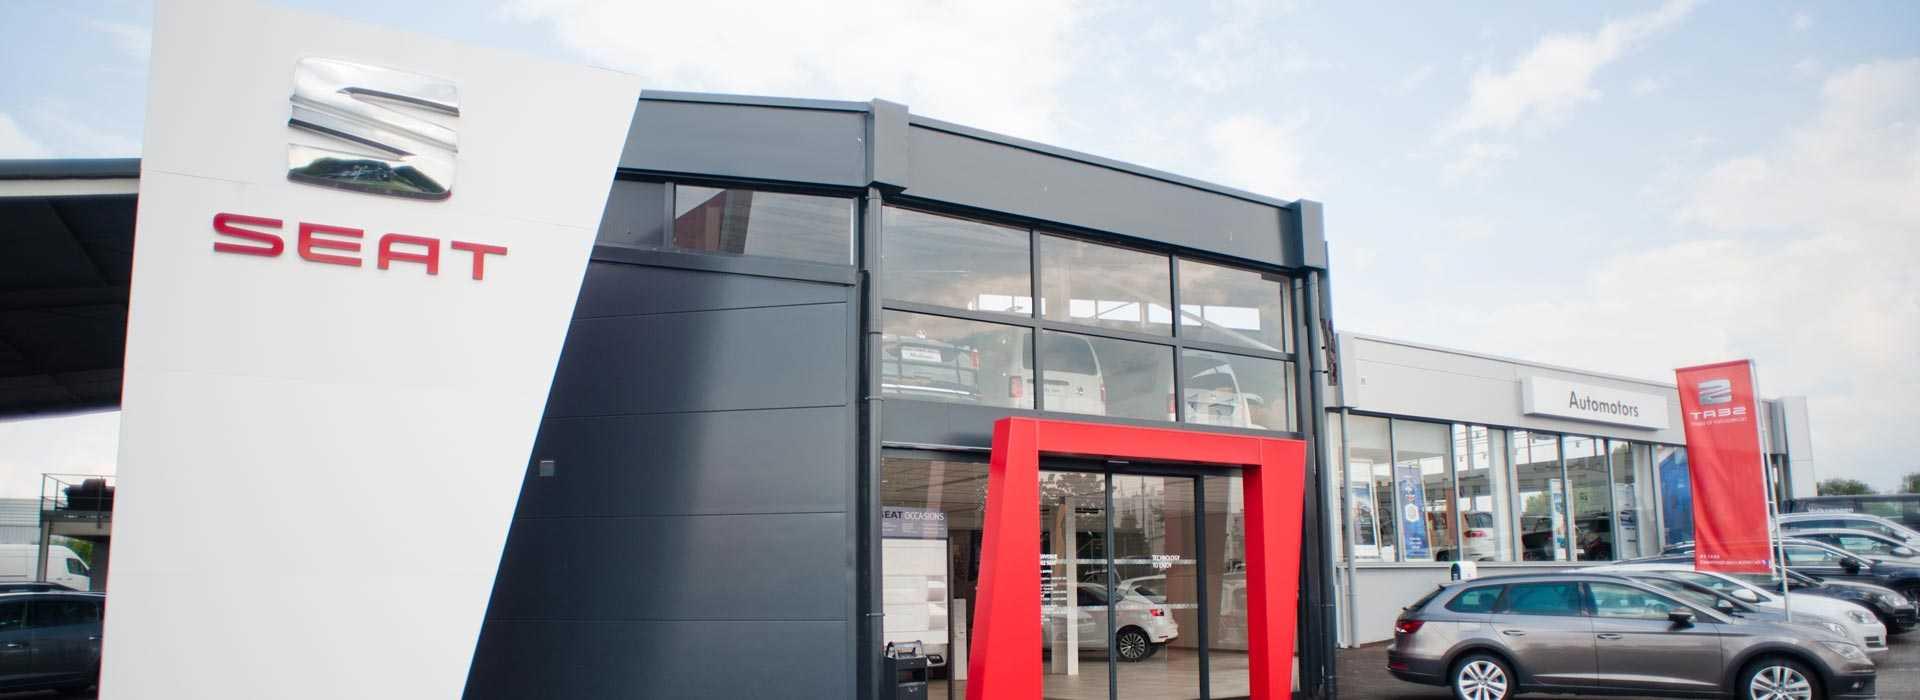 seat nancy concessionnaire garage meurthe et moselle 54. Black Bedroom Furniture Sets. Home Design Ideas